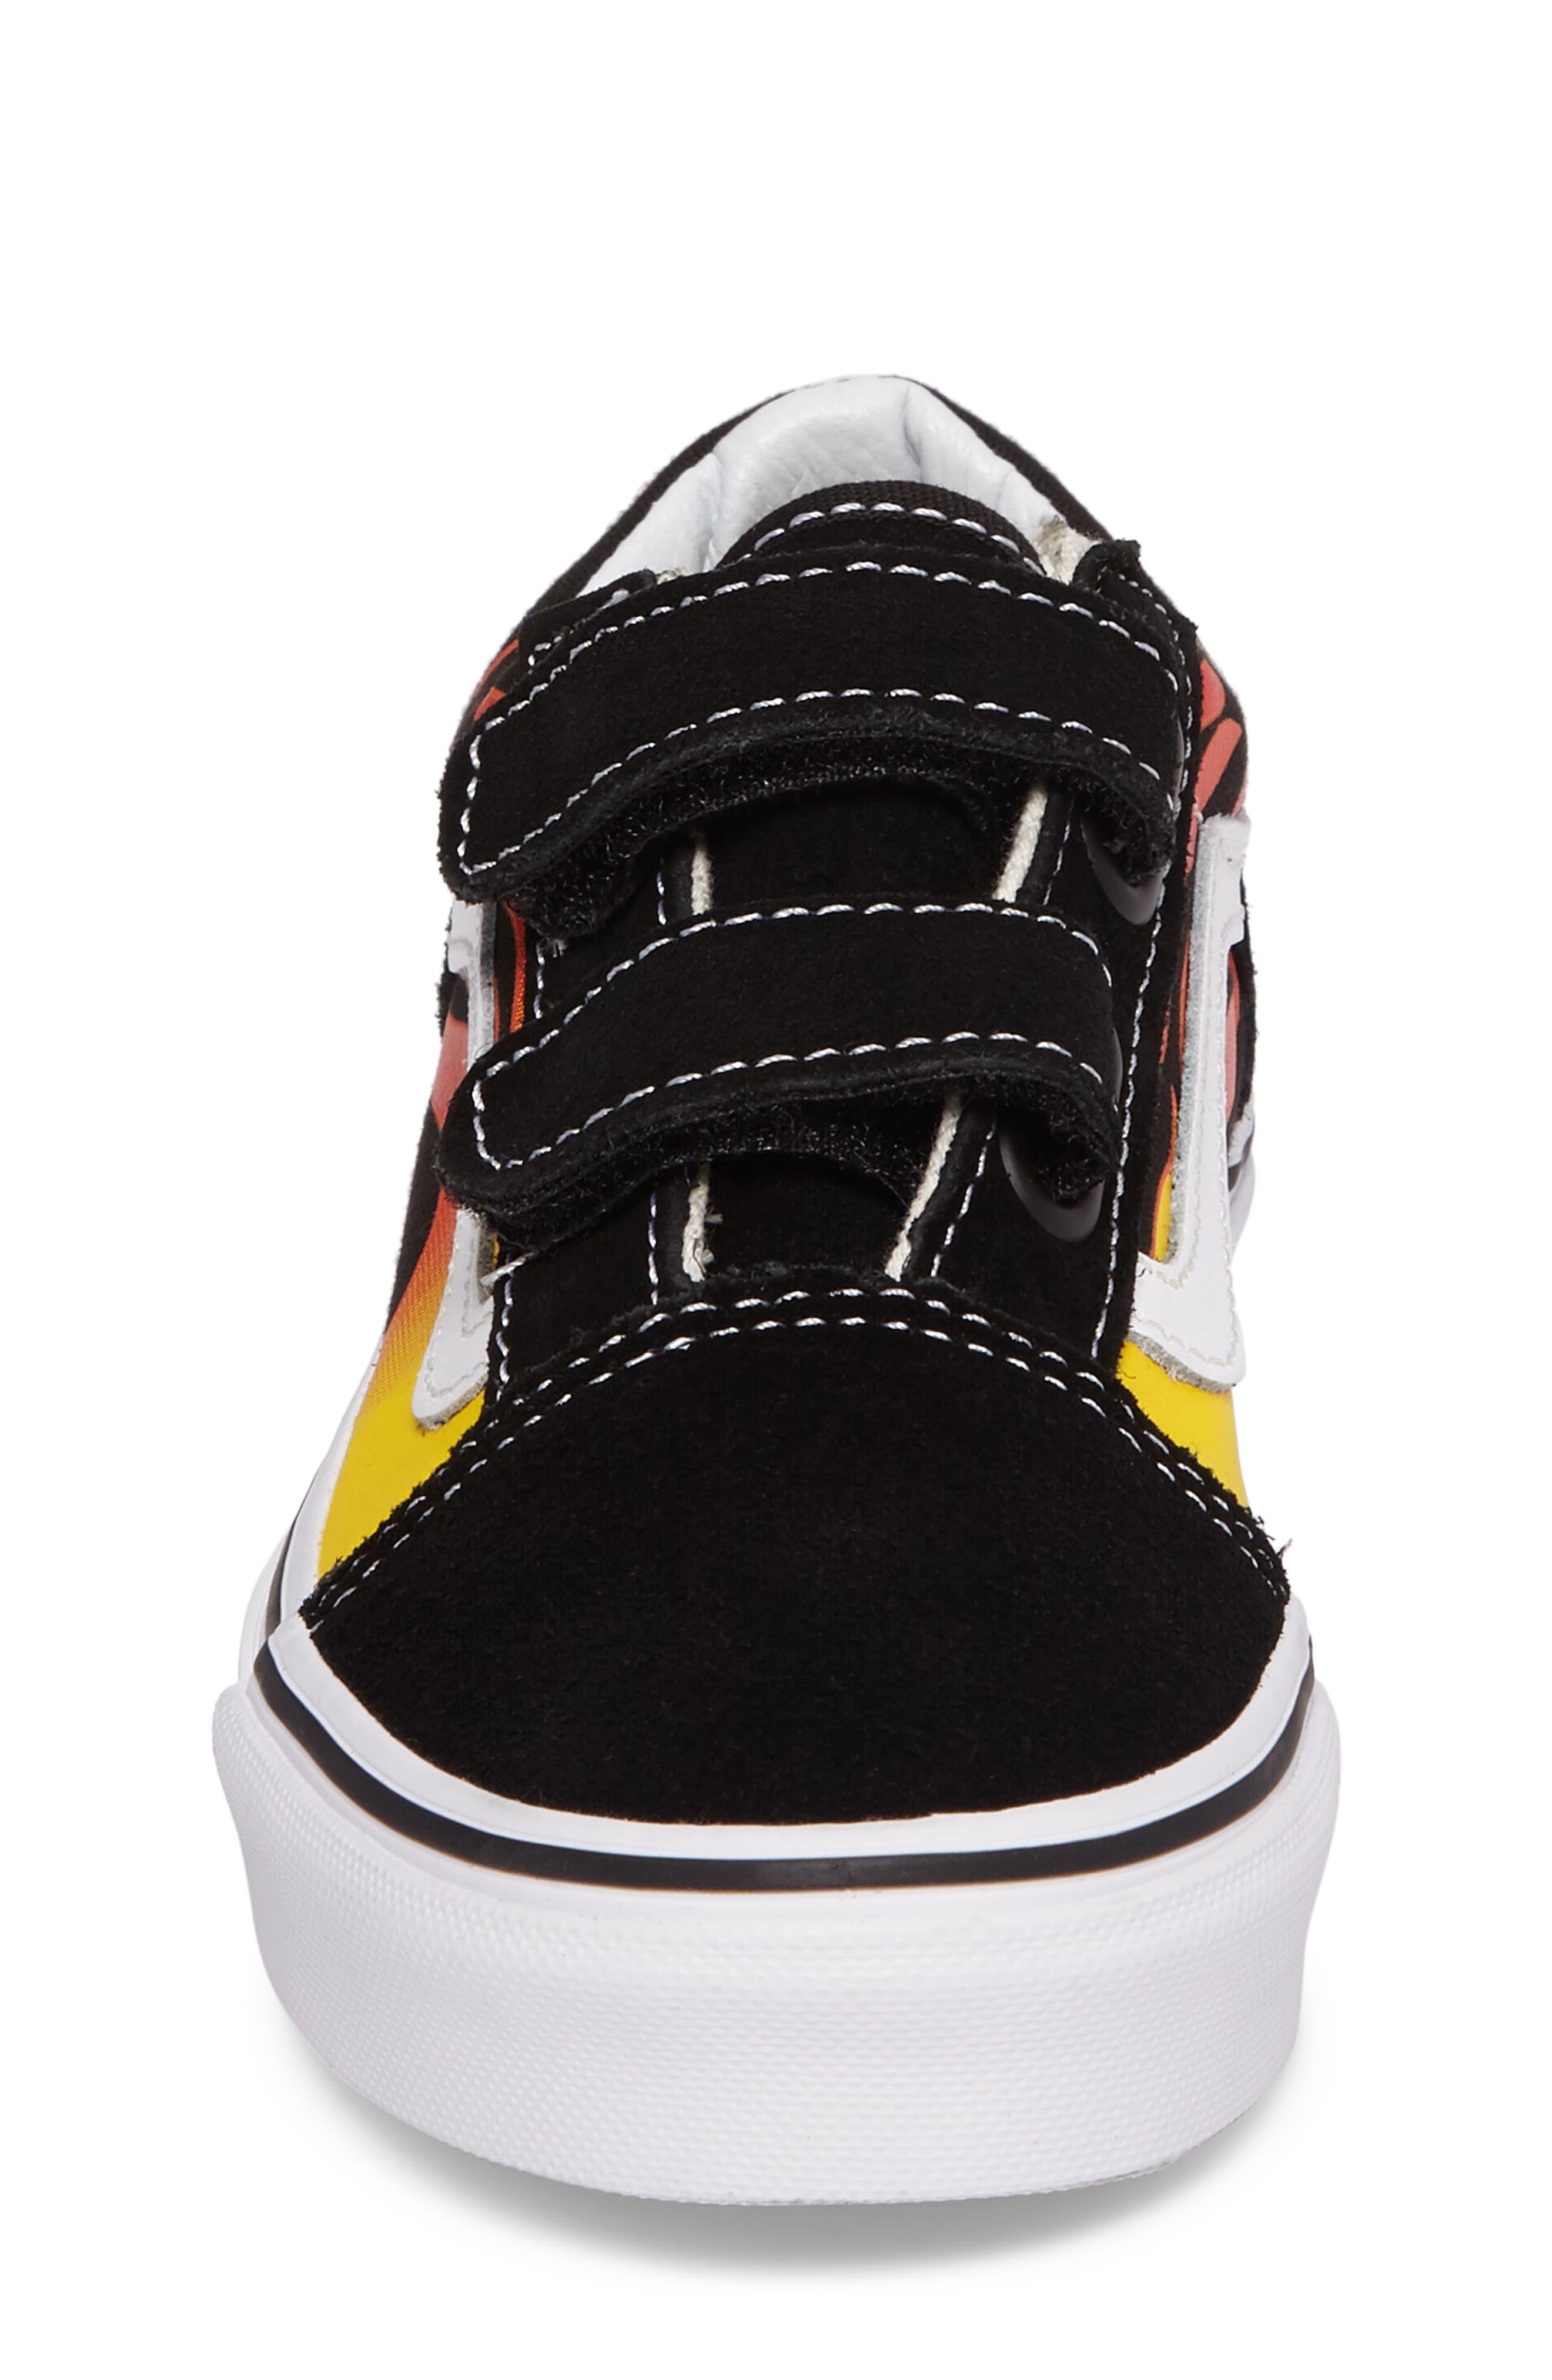 Alternate Image 4  - Vans Old Skool V Sneaker (Baby, Walker, Toddler, Little Kid & Big Kid)